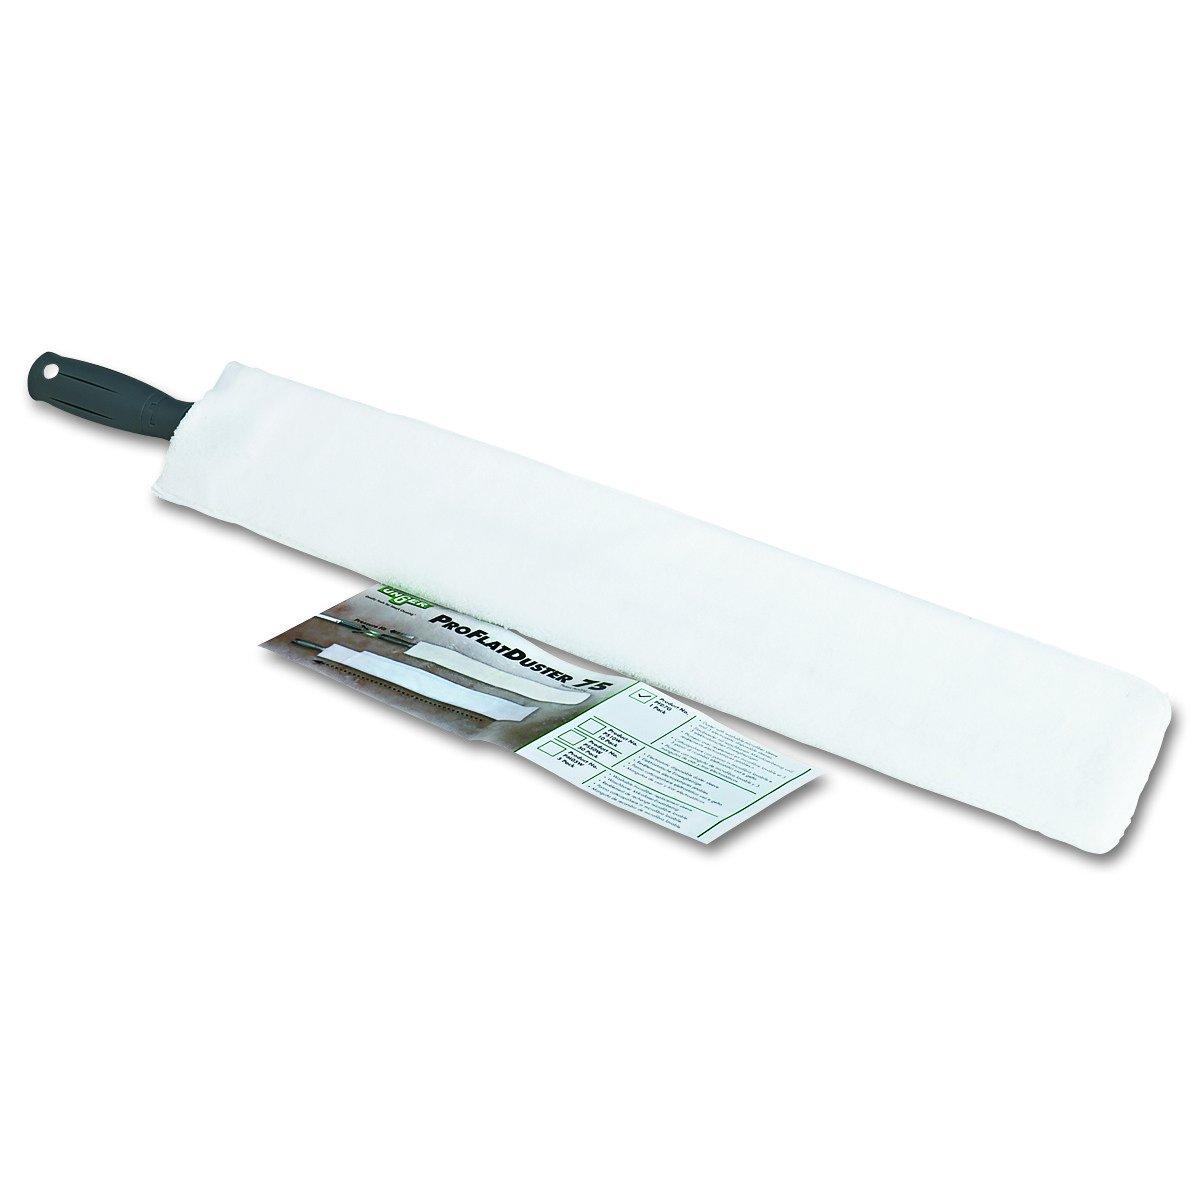 Unger PFD7G Proflat Duster 75, Reusable Microfiber, Washable, 30'' Length